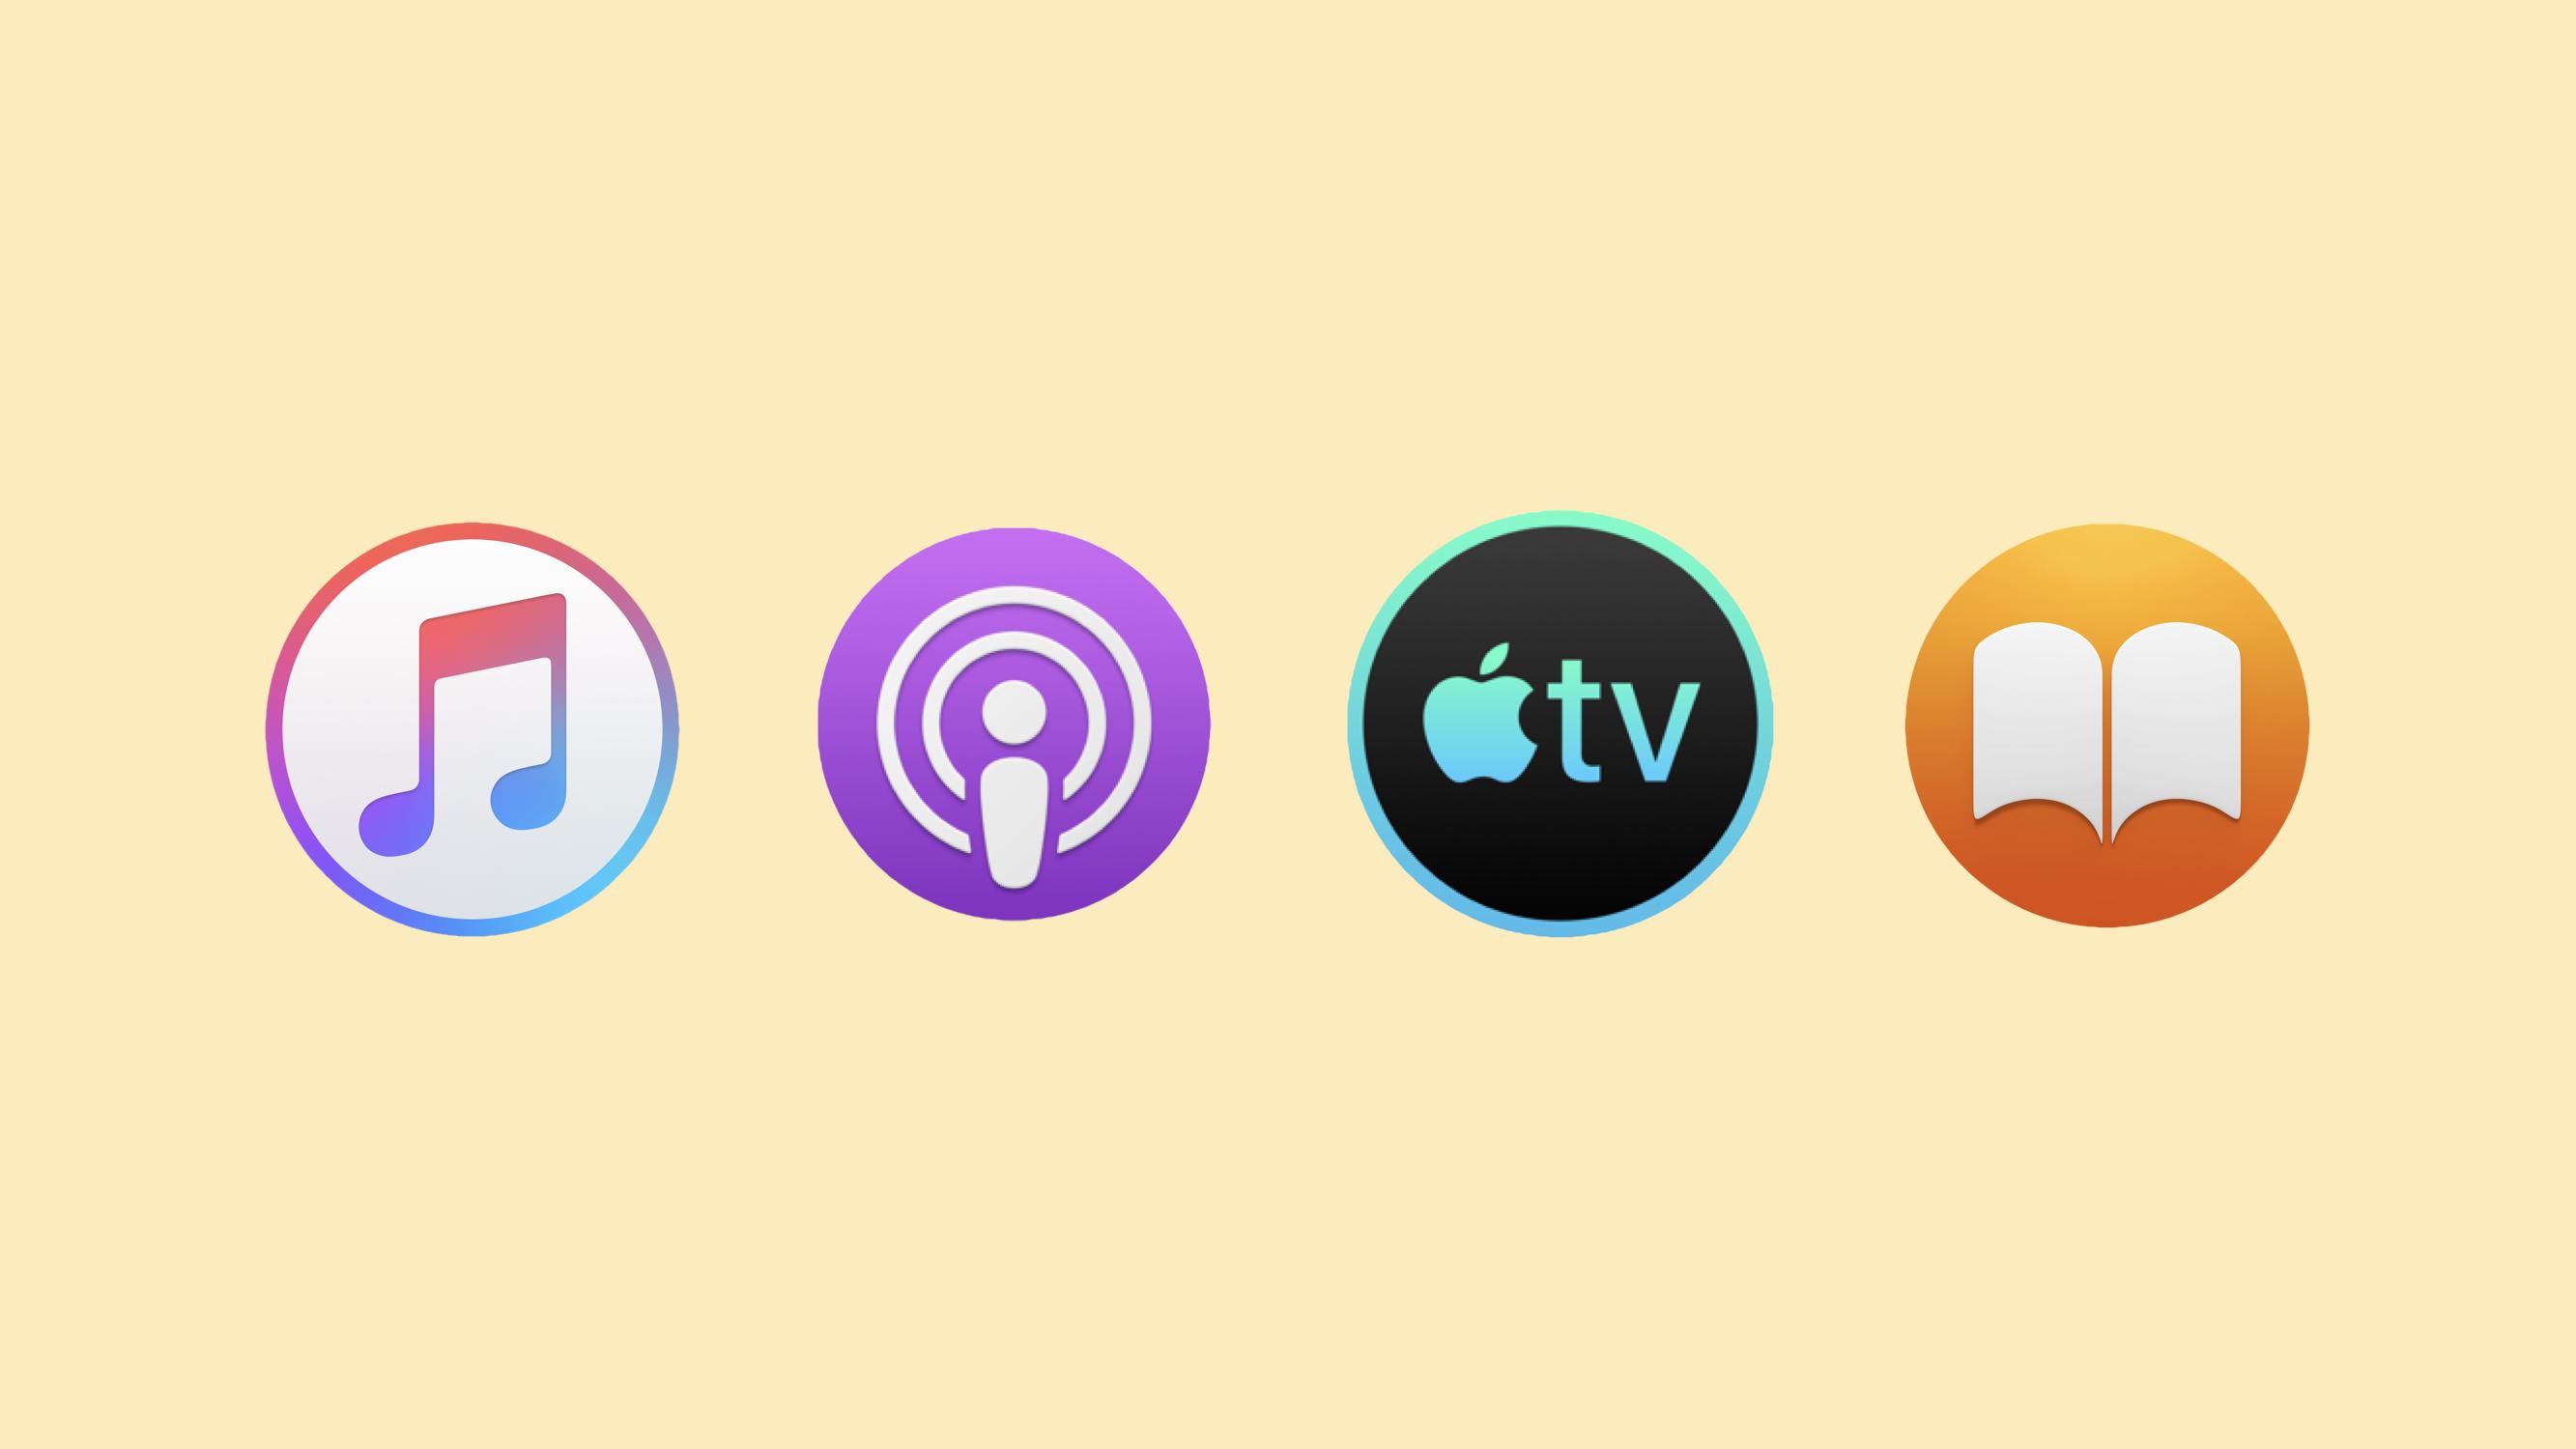 iTunes macOS 10.15 apps